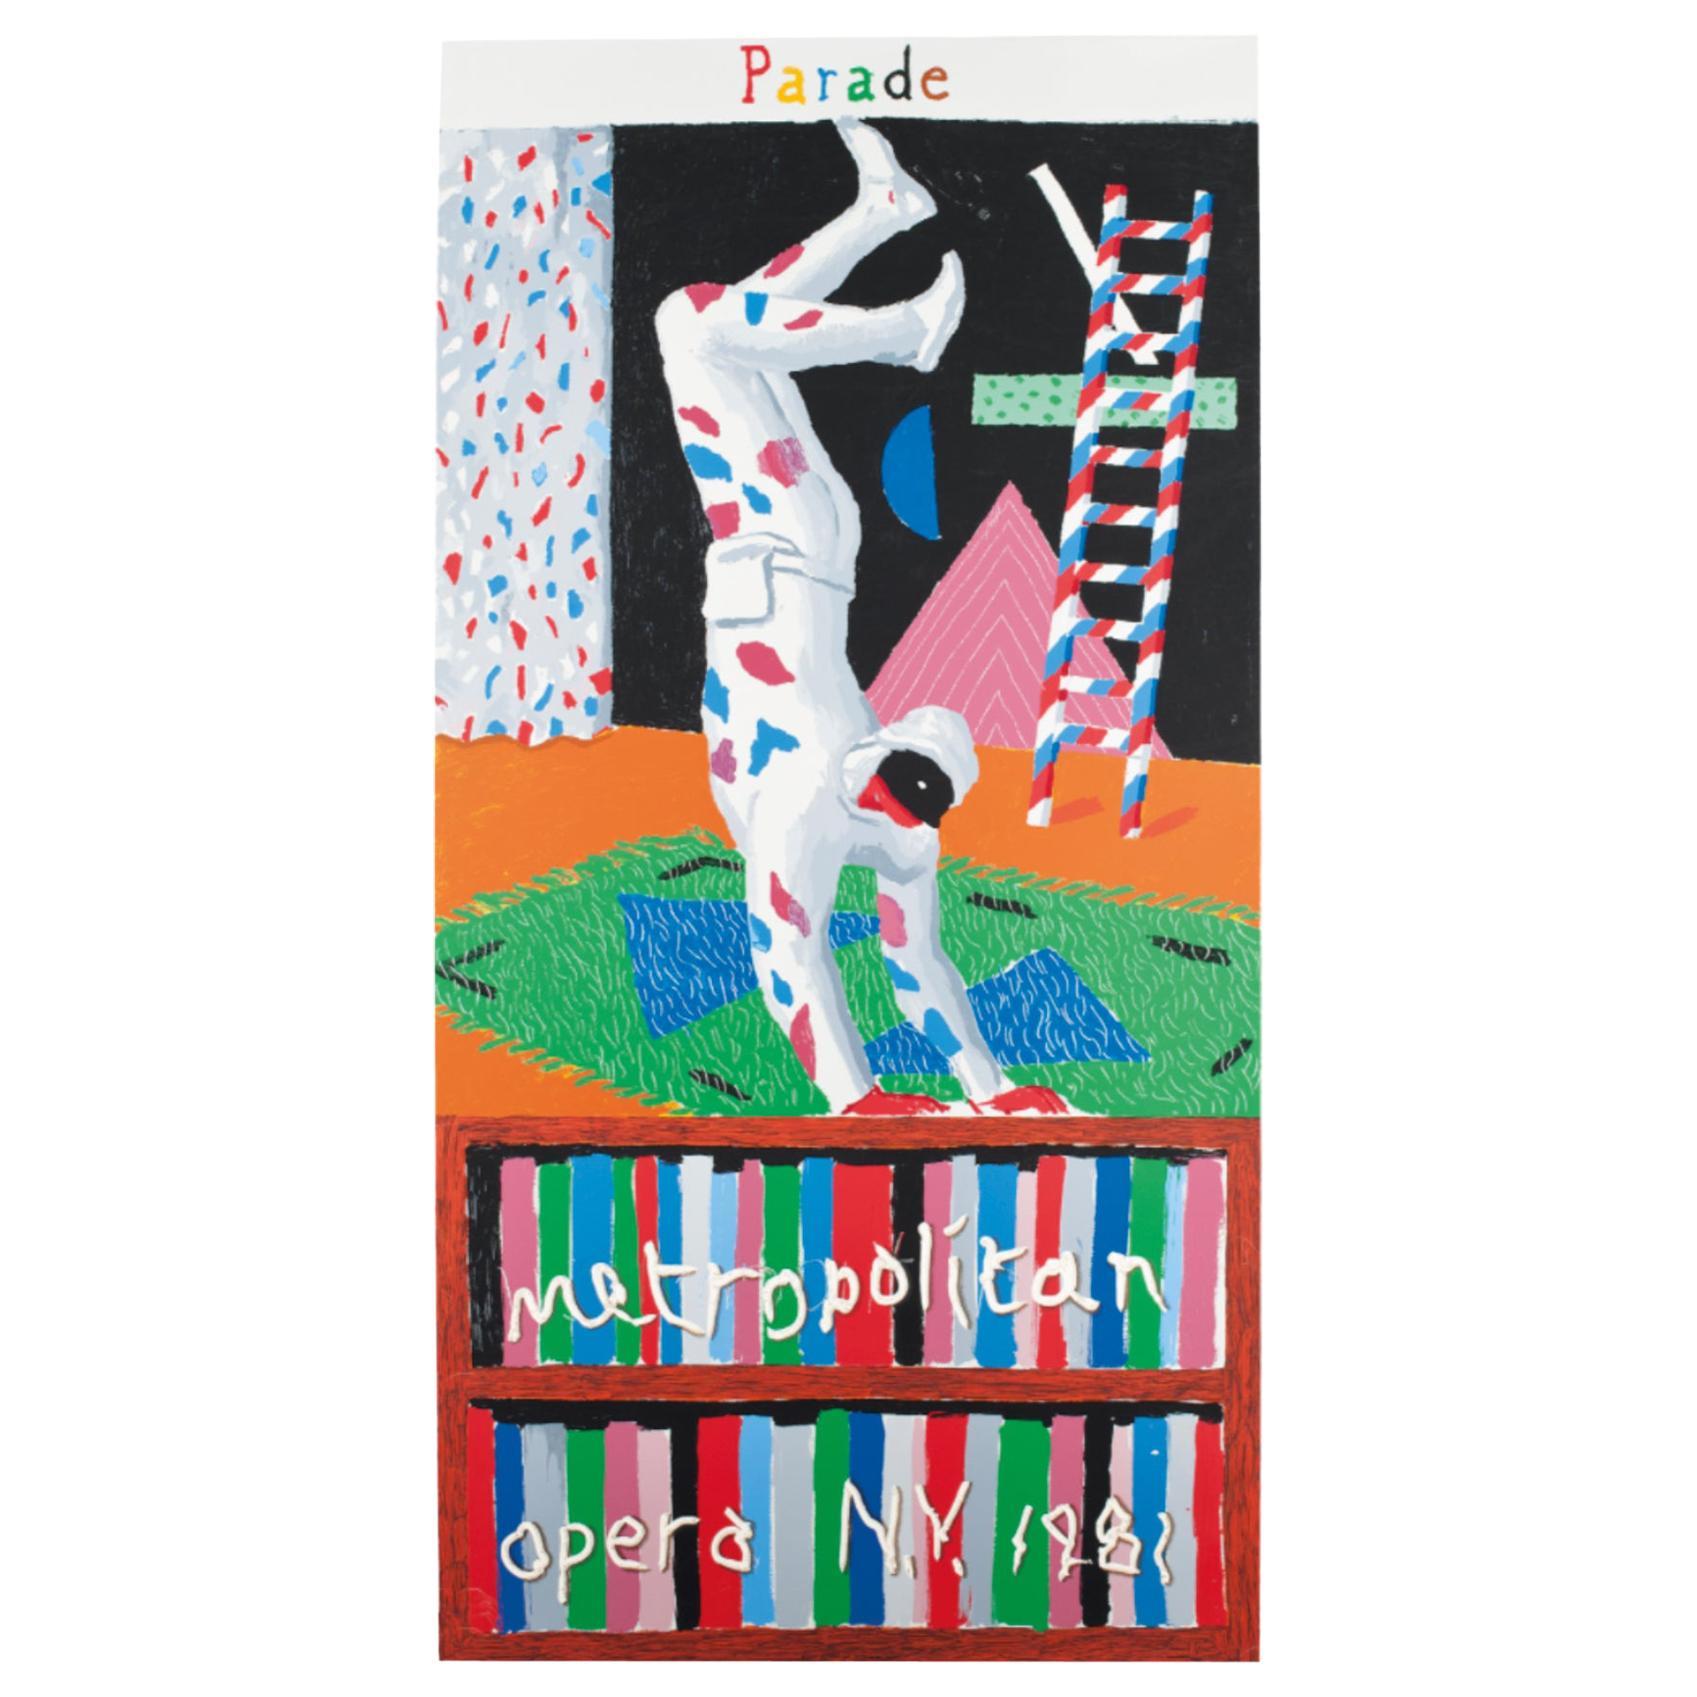 David Hockney Original Vintage Poster 'Parade Metropolitan Opera New York 1981'